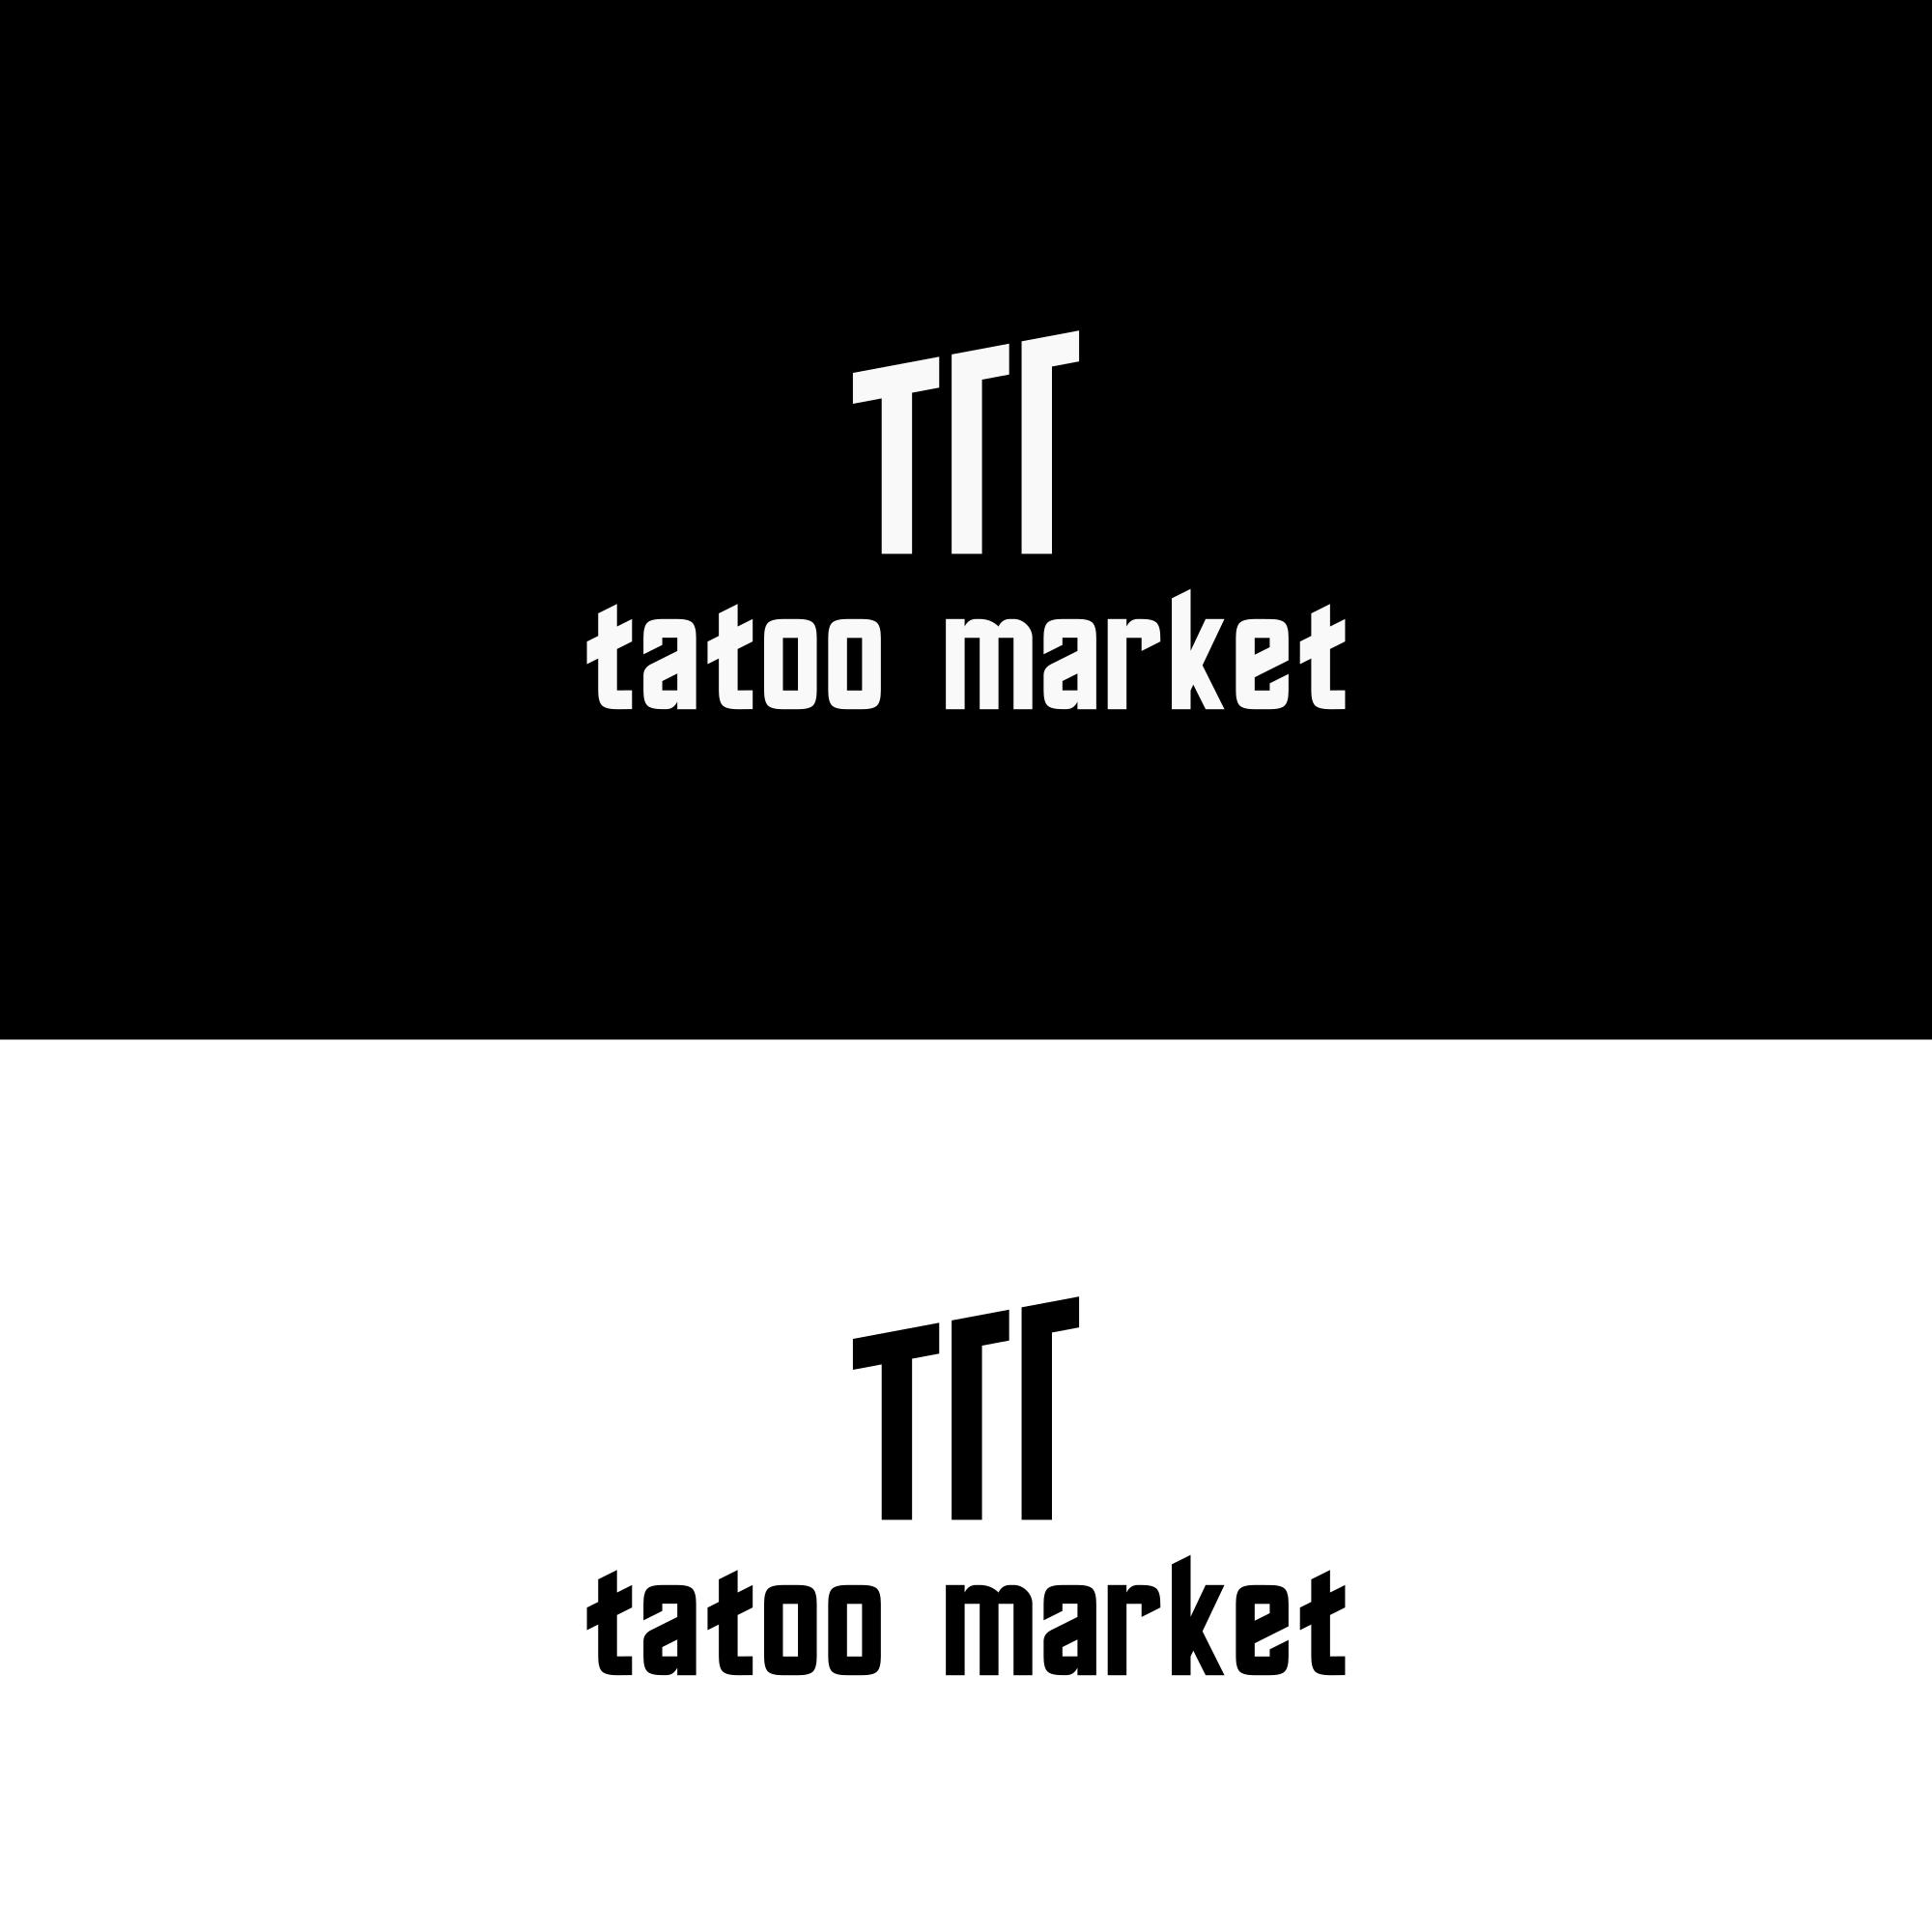 Редизайн логотипа магазина тату оборудования TattooMarket.ru фото f_5845c53546467cbe.png